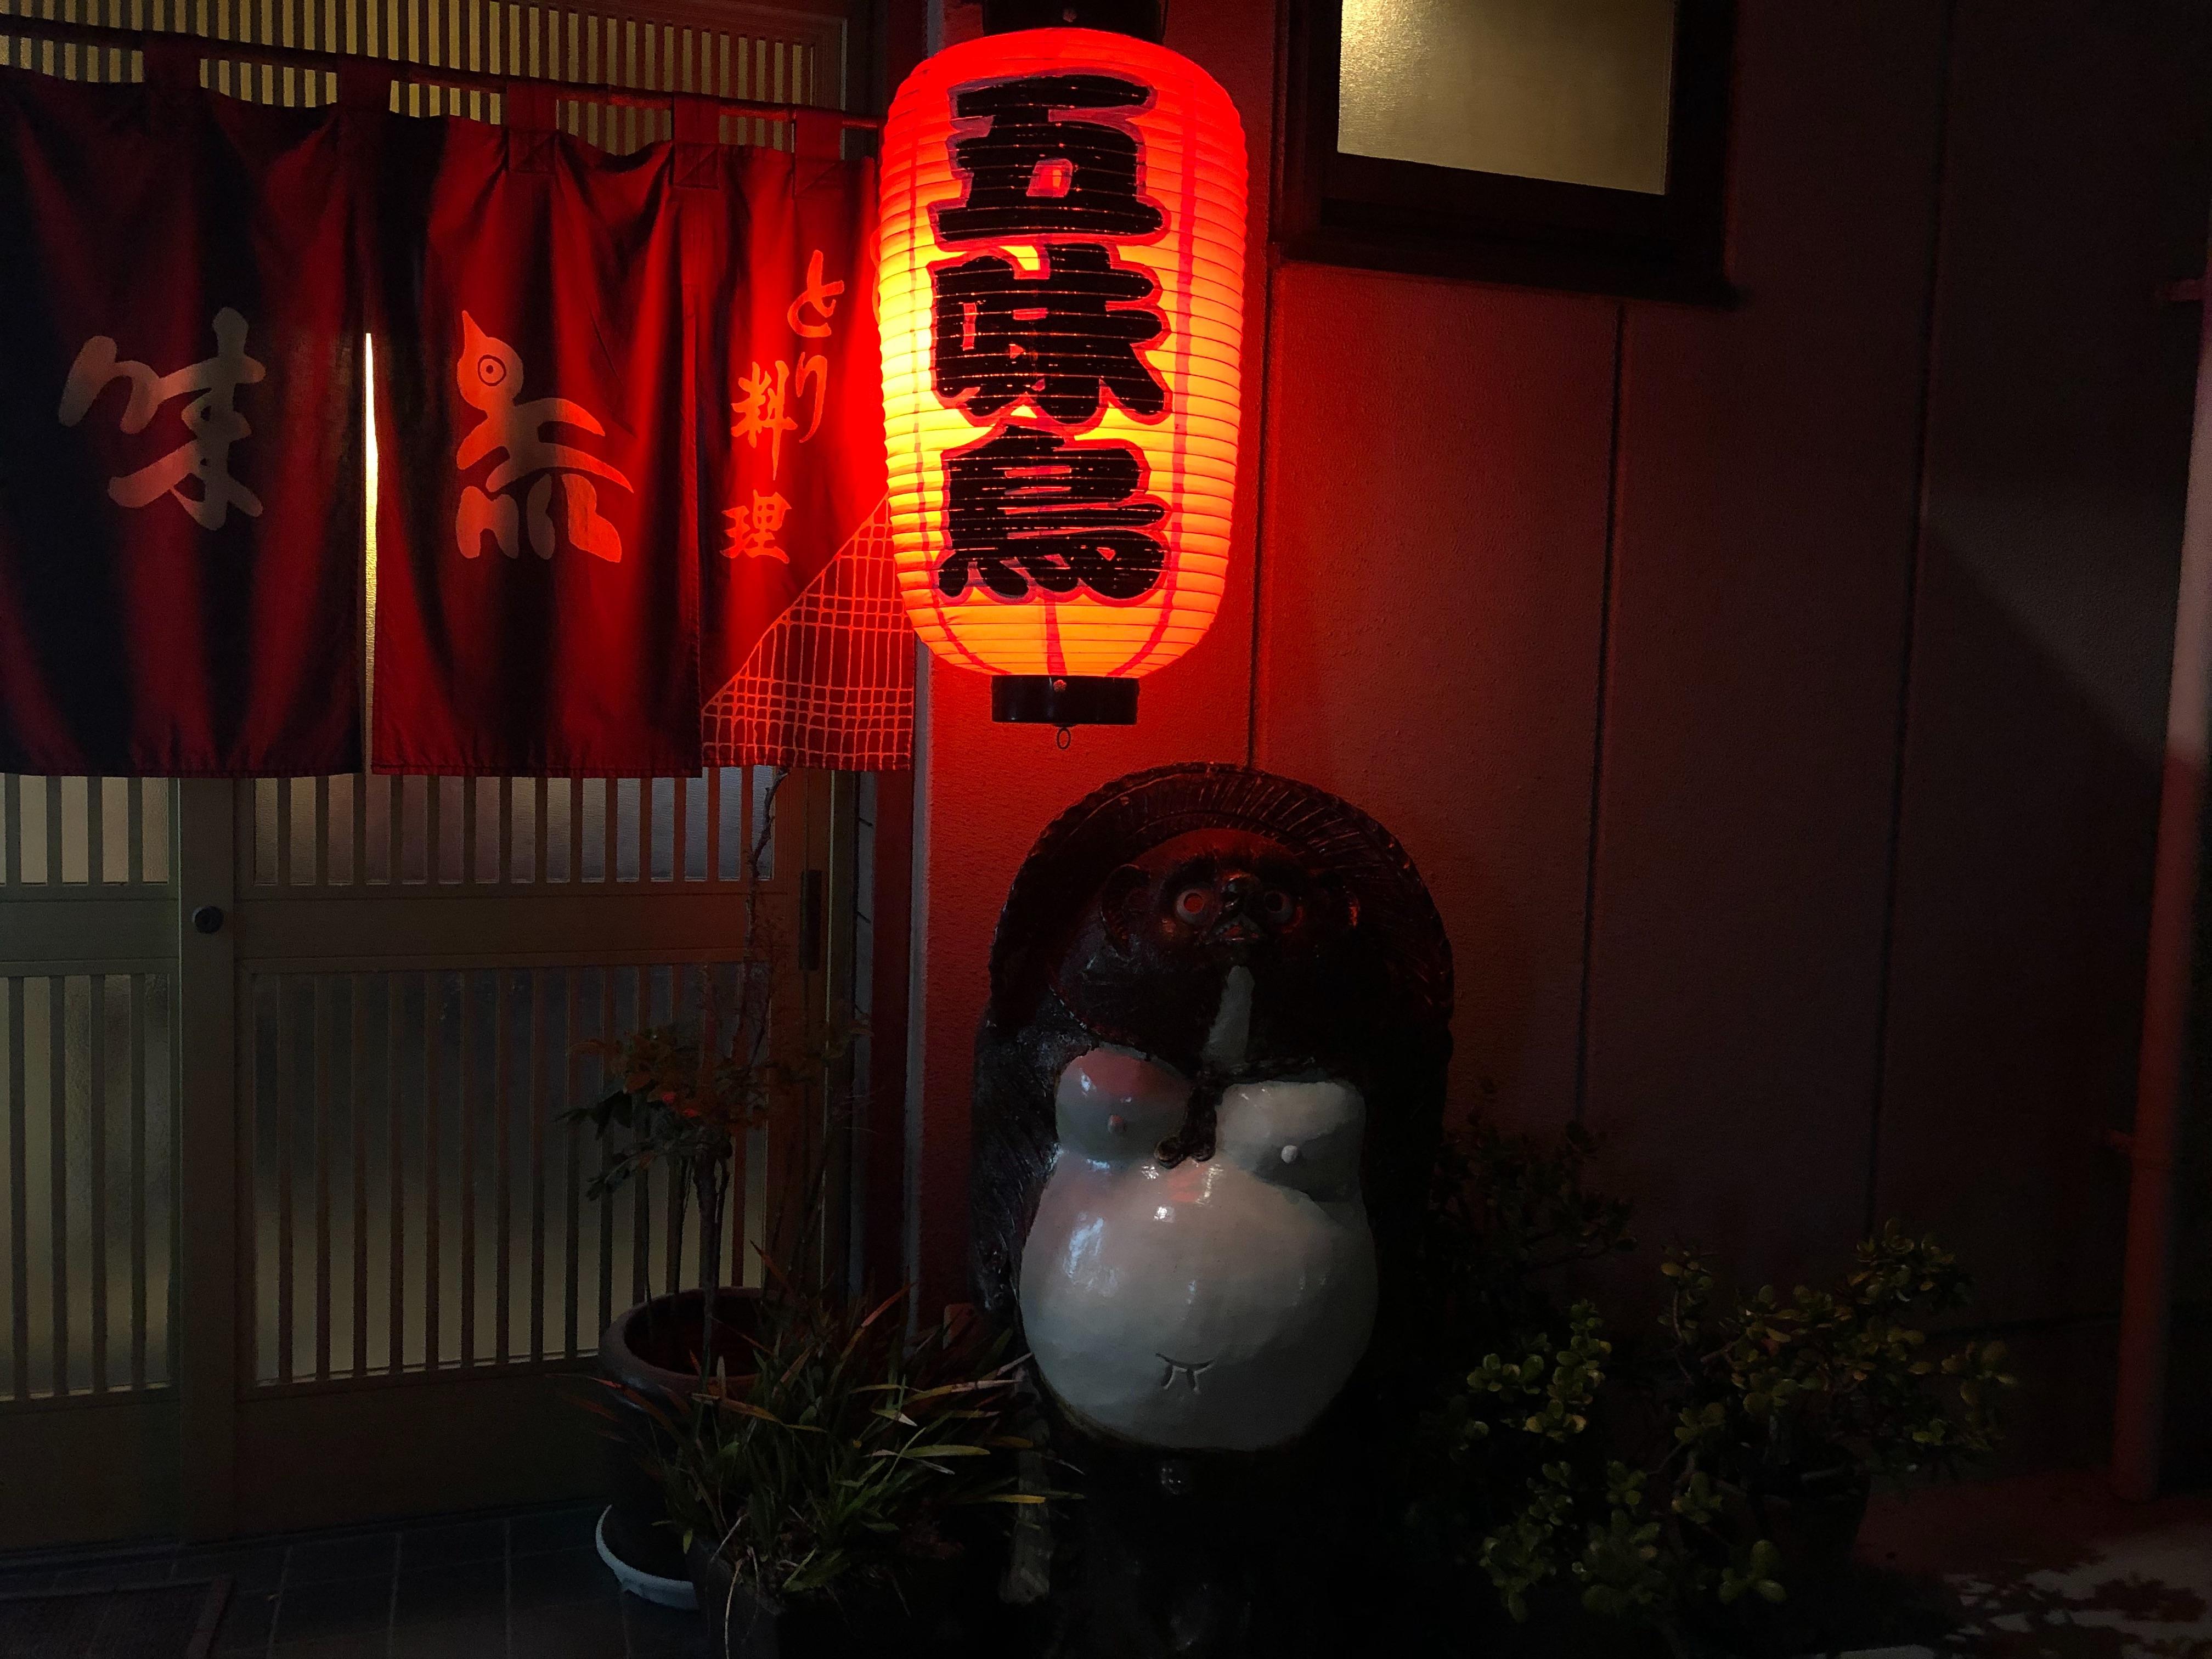 f:id:masanori-kato1972:20190801214914j:image